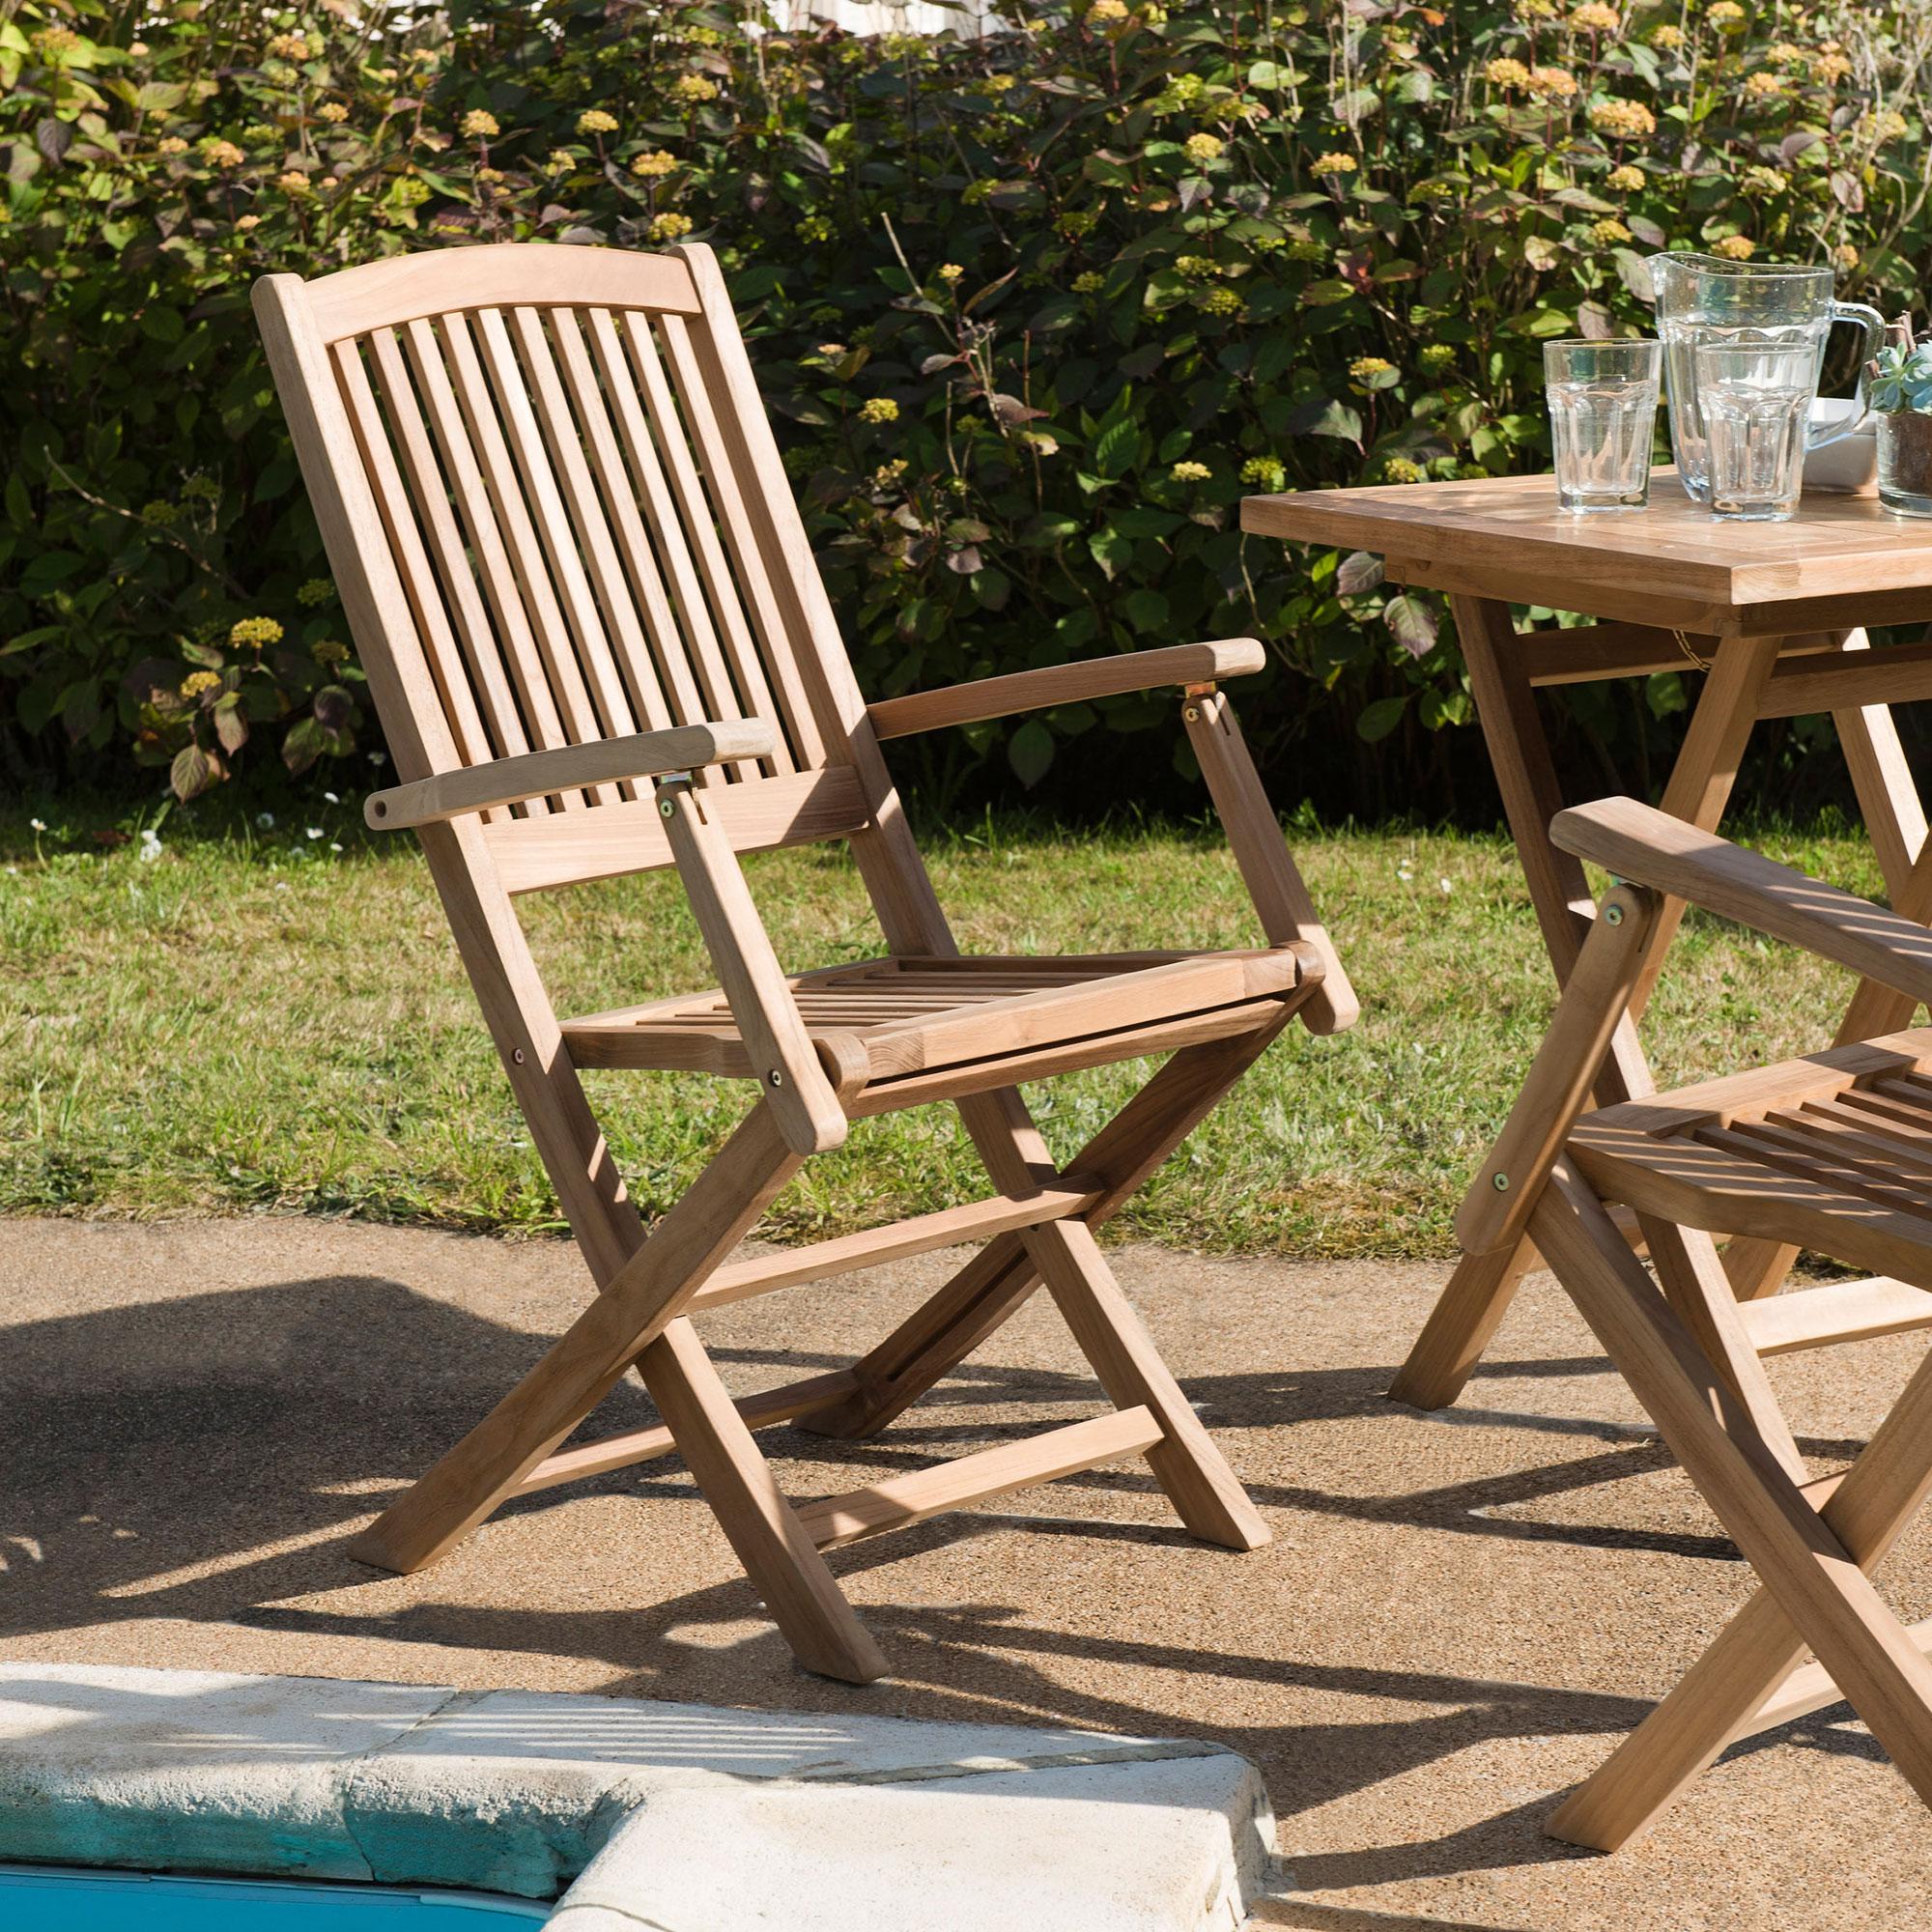 Lot de 2 fauteuils en teck massif - GARDENA